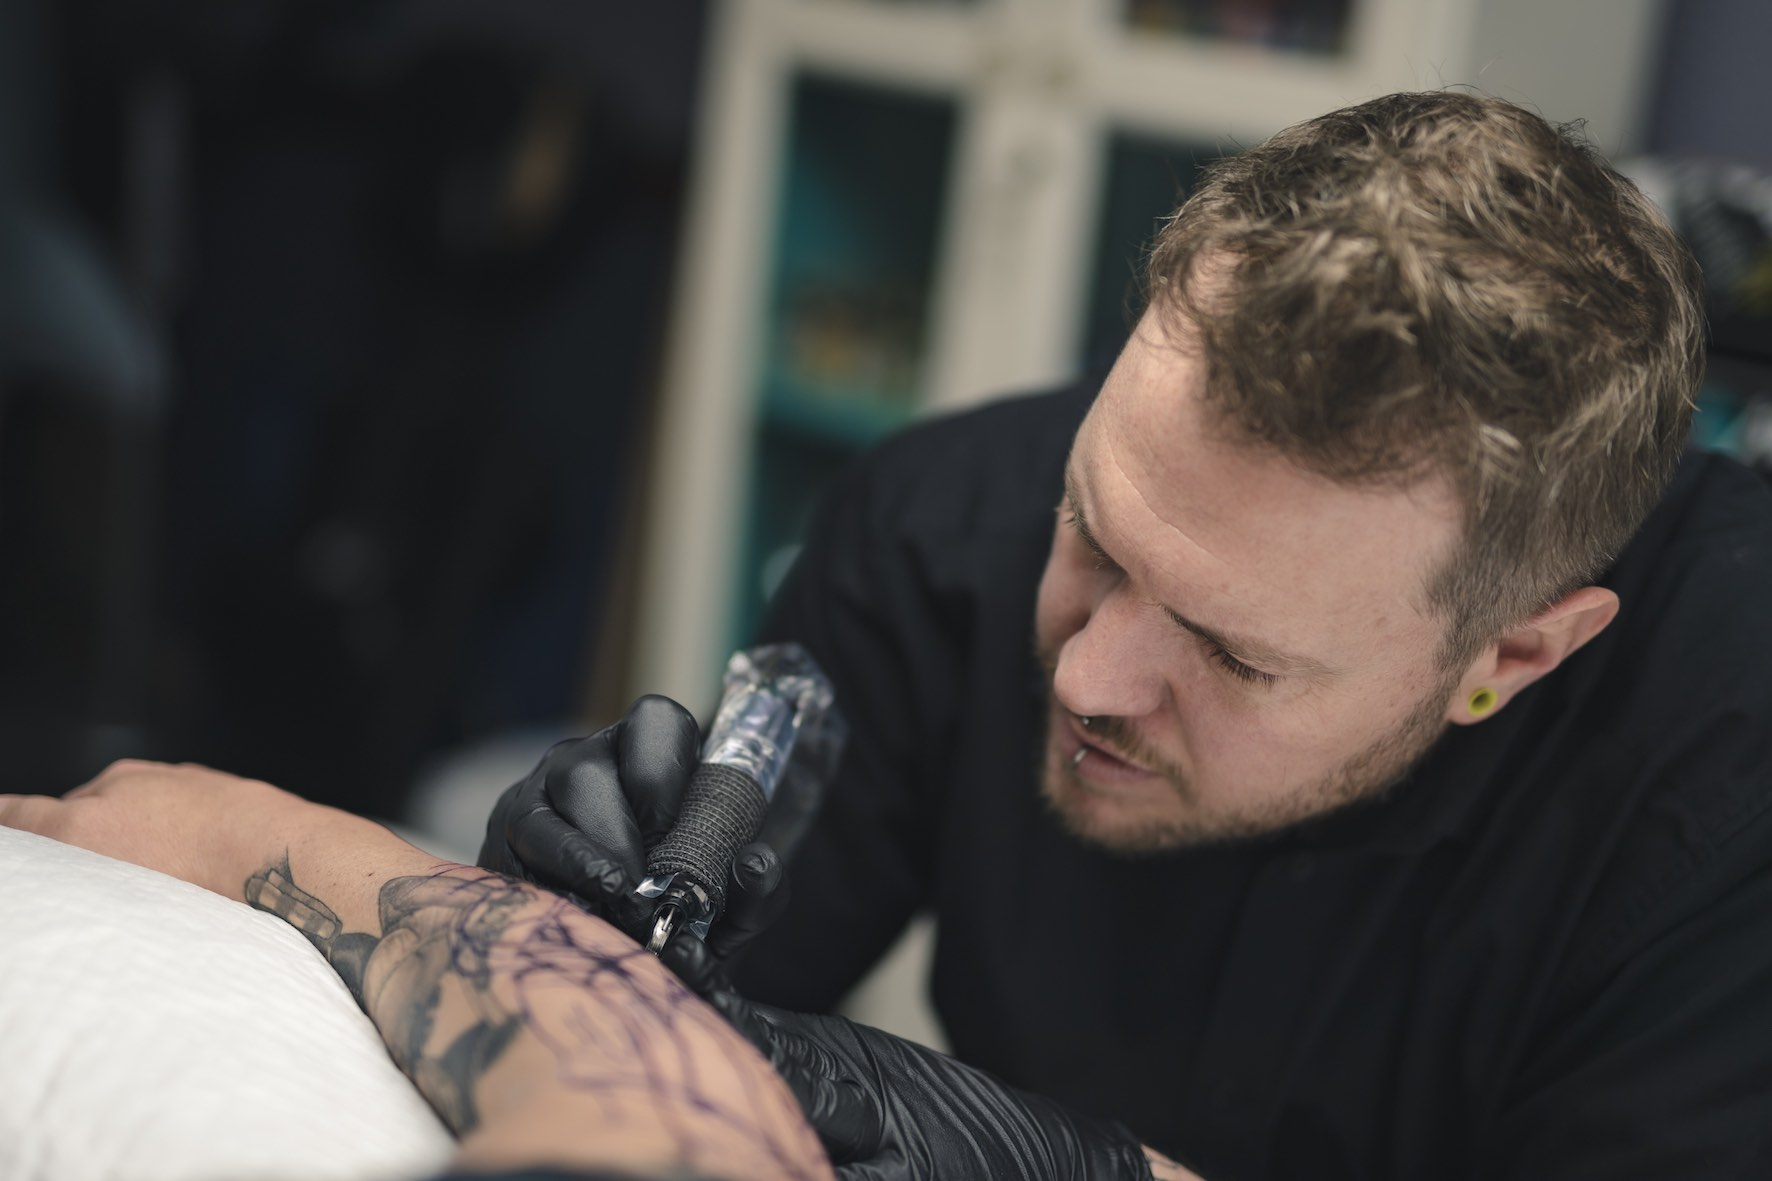 Adam Megens tattooing a loyal client